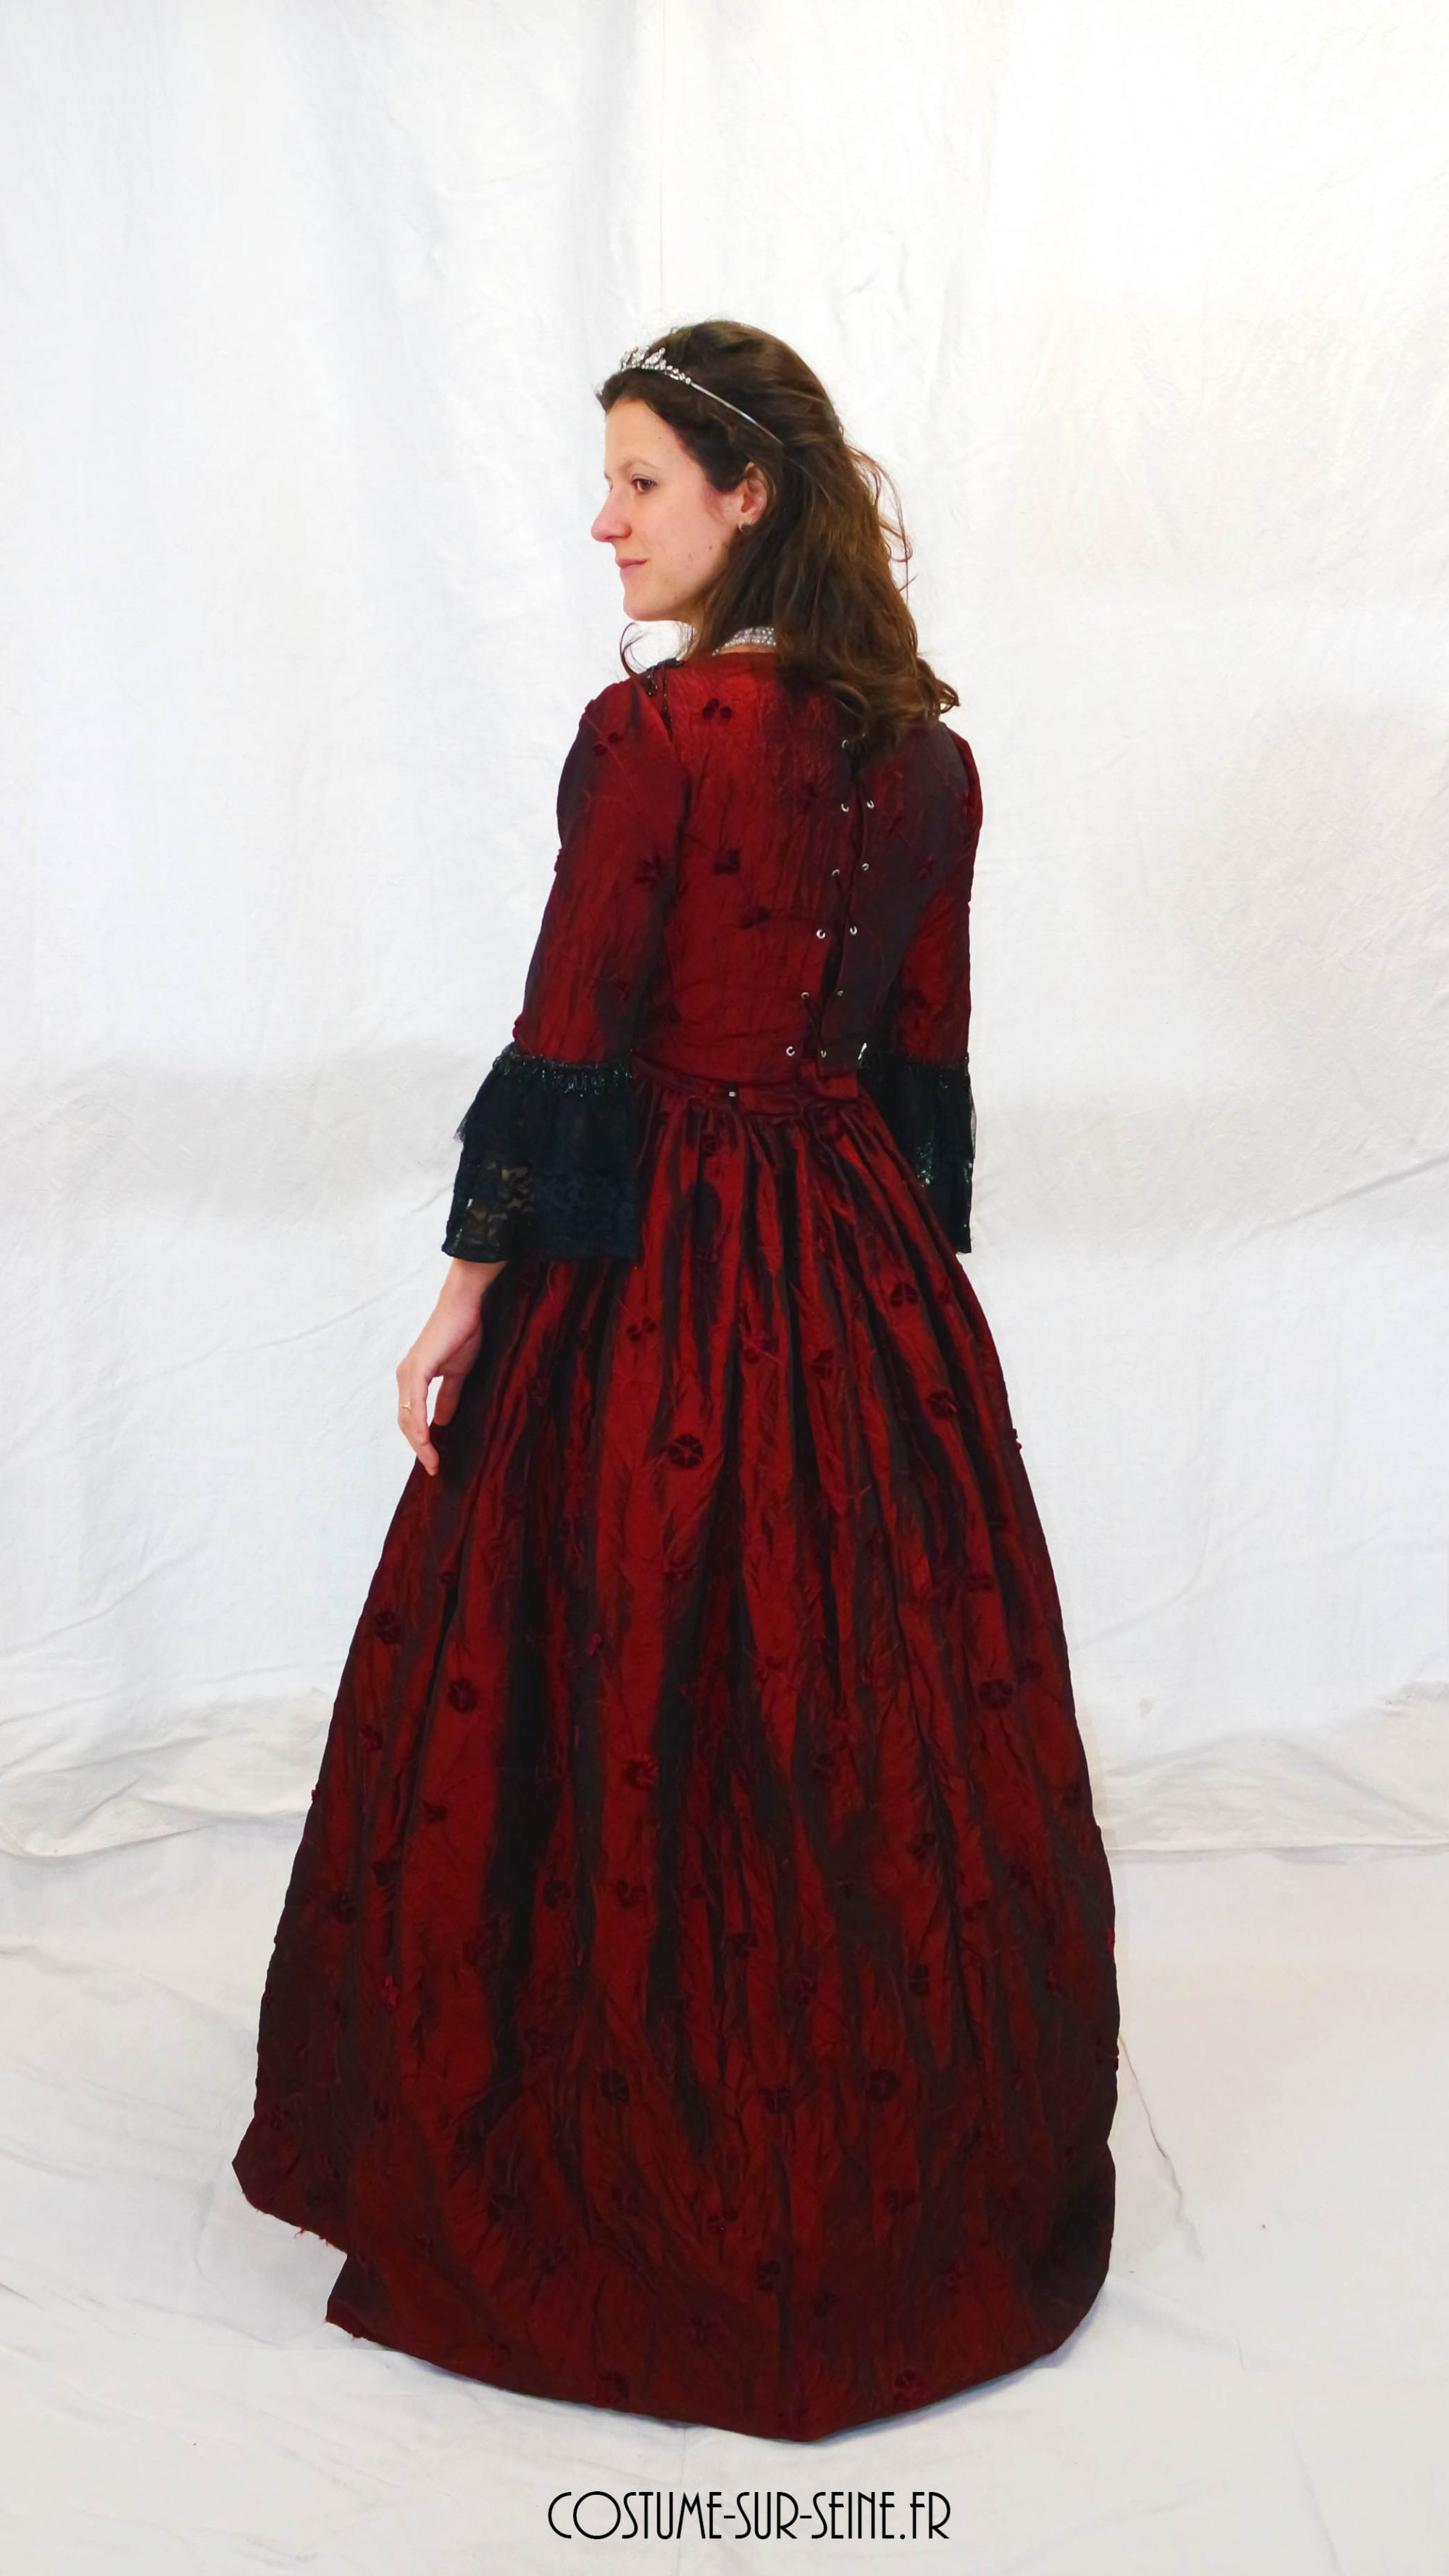 robe XVIIIe rouge et noir dos